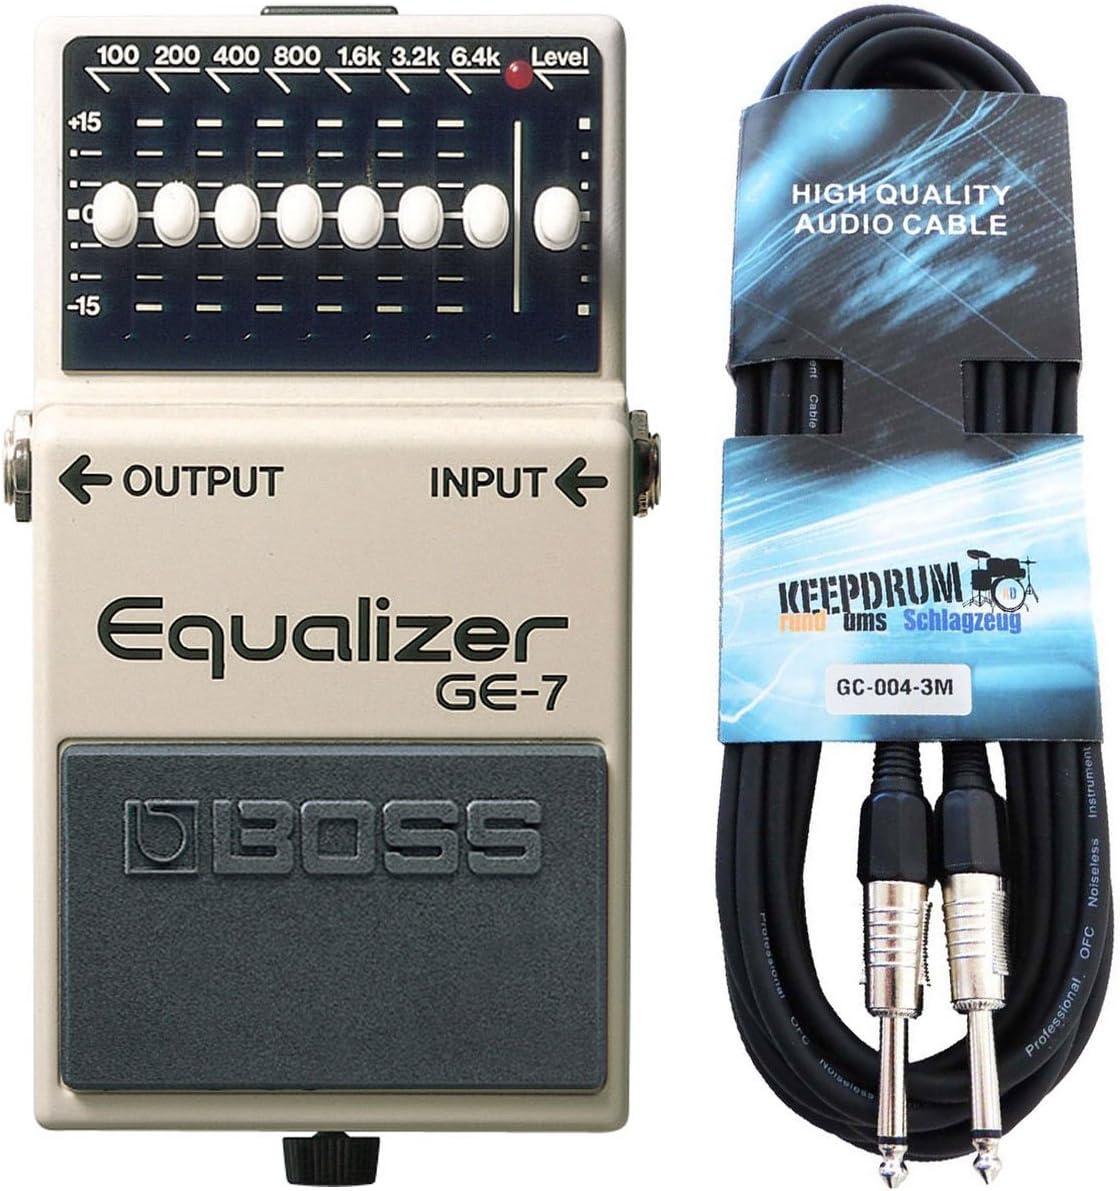 Boss GE de 7graphischer Ecualizador para guitarra Keepdrum Cable para guitarra